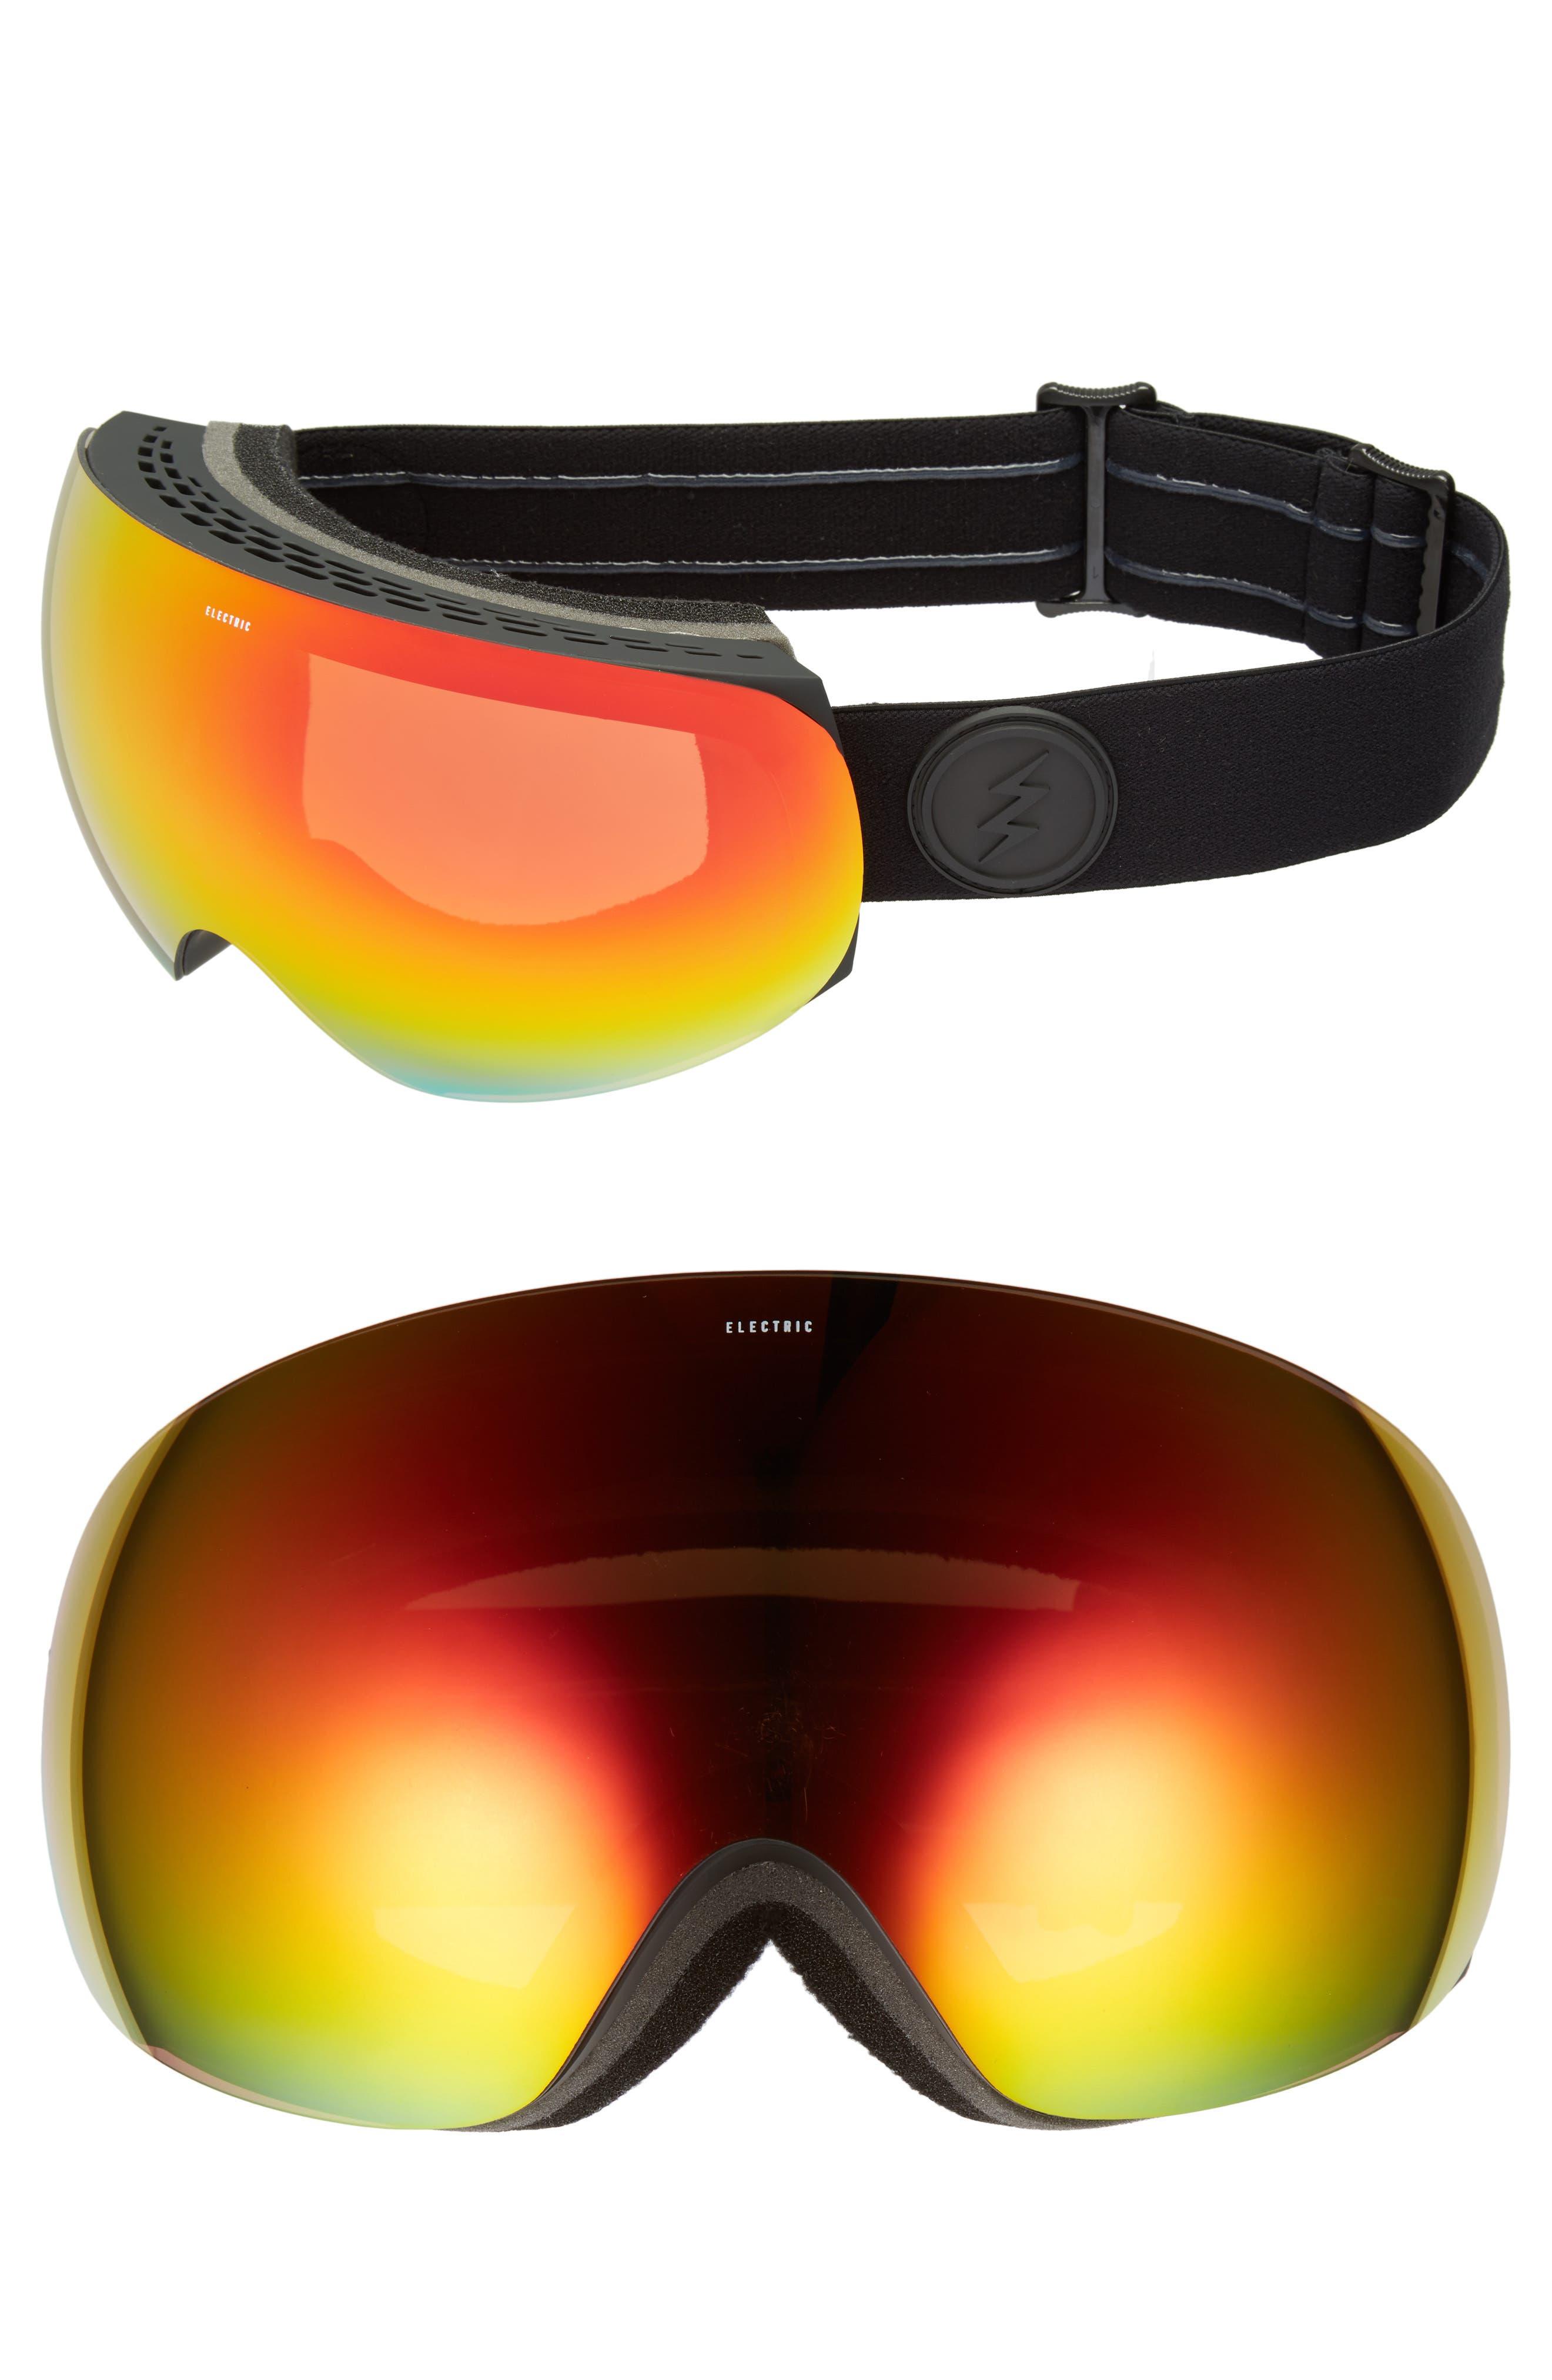 EG3 Snow Goggles,                             Main thumbnail 1, color,                             001